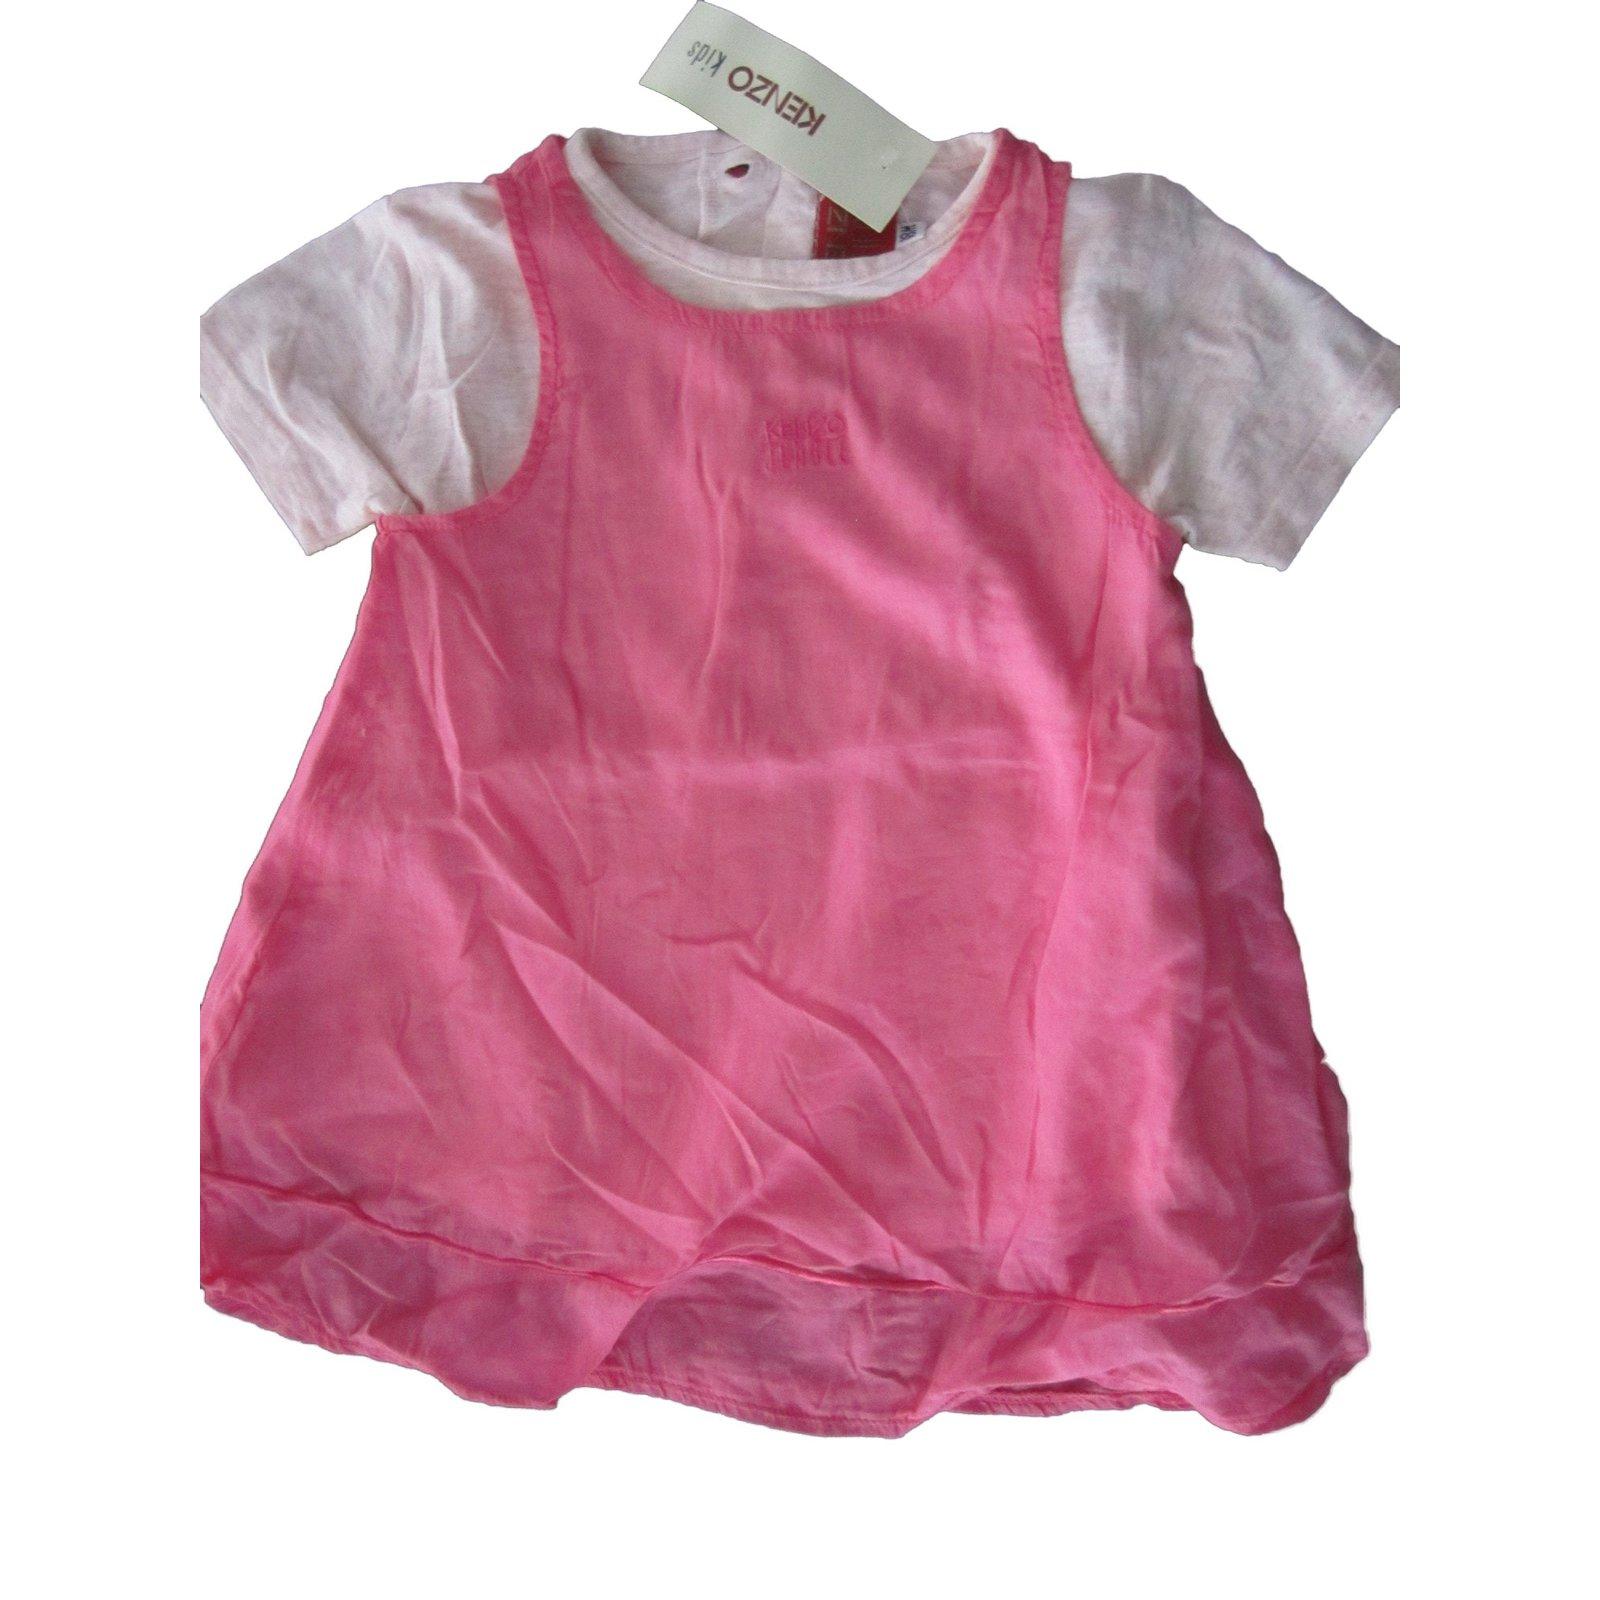 Kenzo Dresses Dresses Cotton Pink ref Joli Closet